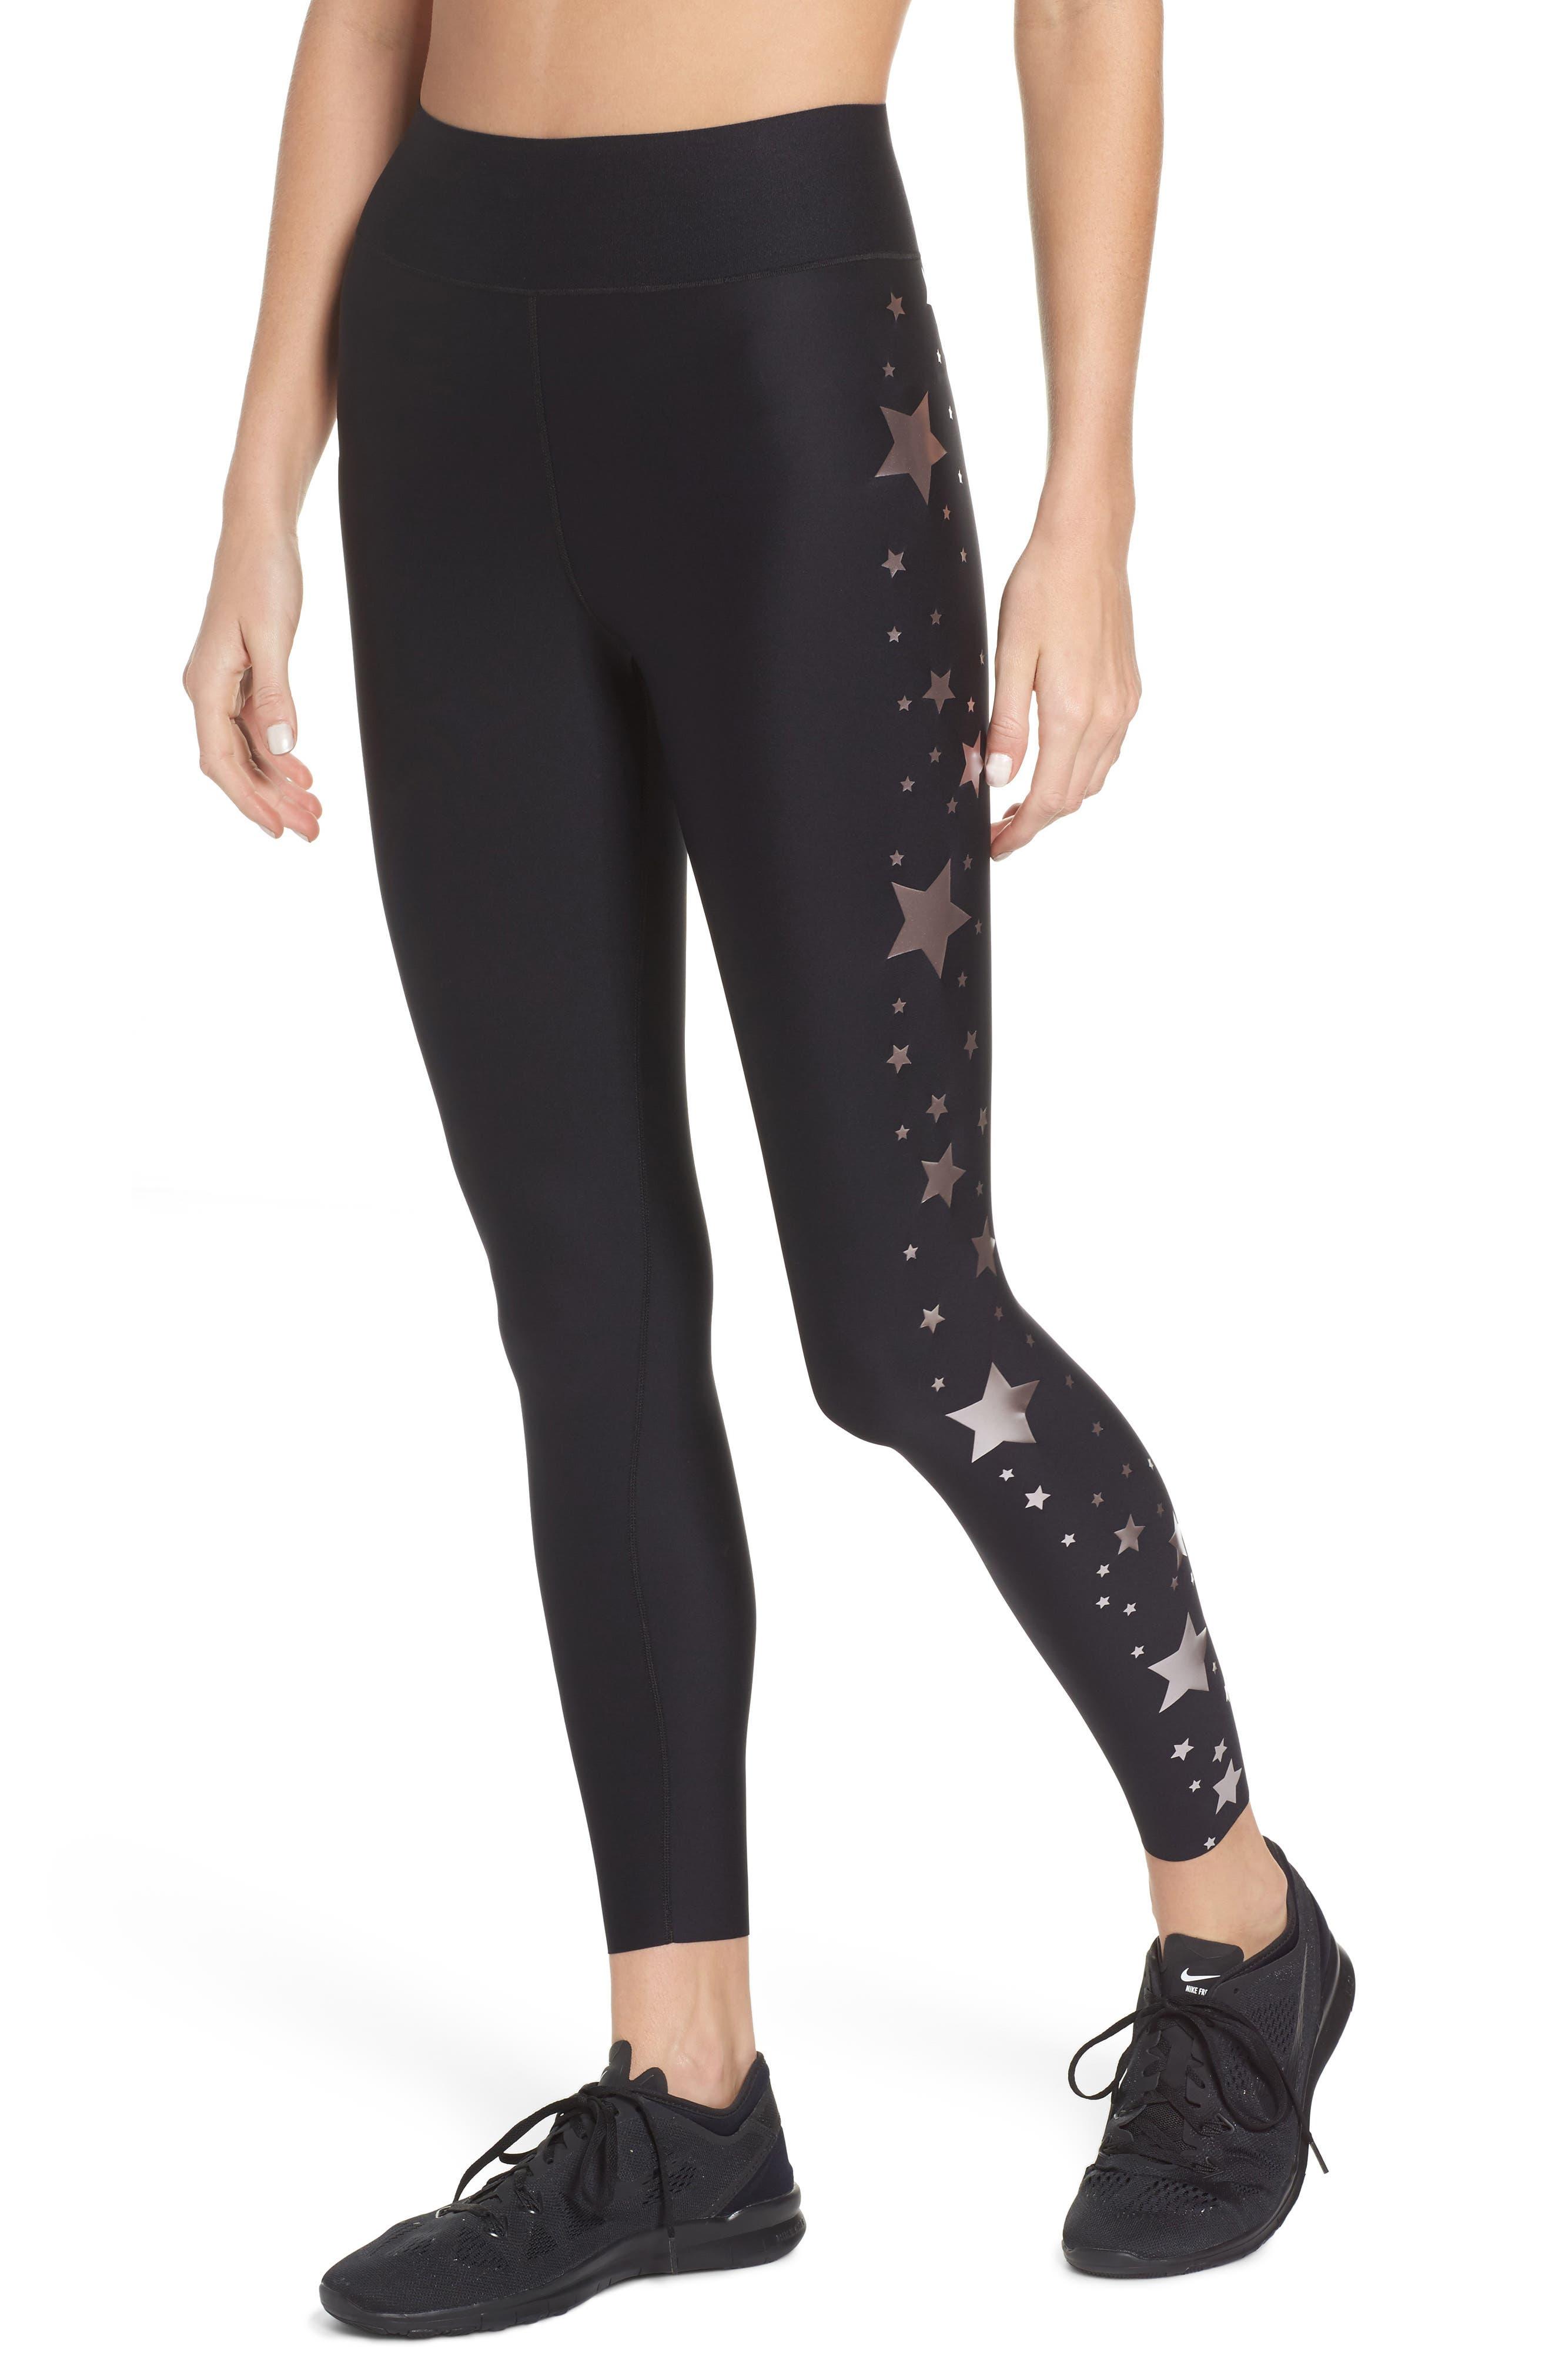 Lux Stellar High Waist Leggings,                         Main,                         color, Nero Rose